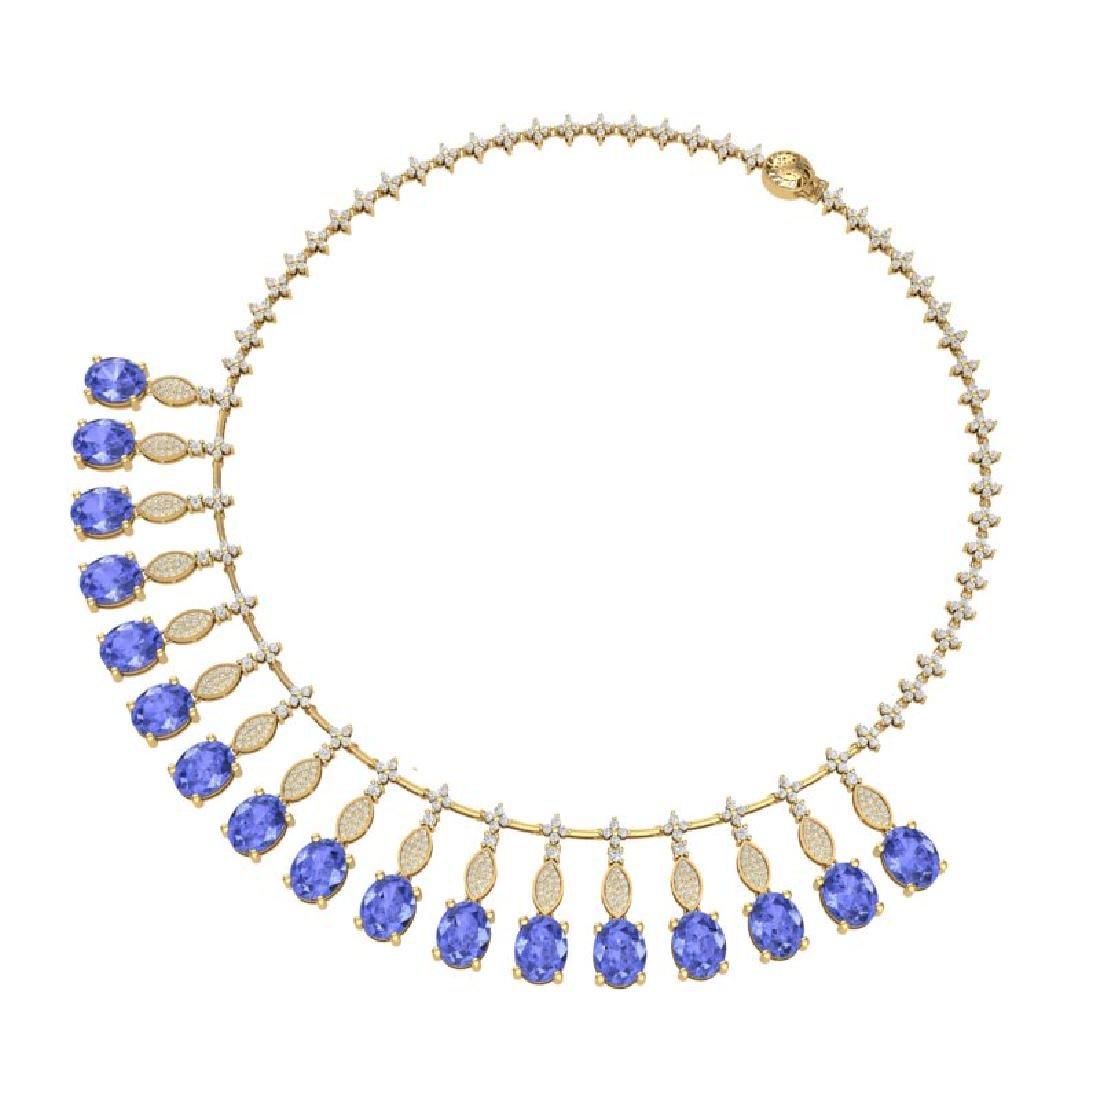 57.15 CTW Royalty Tanzanite & VS Diamond Necklace 18K - 3